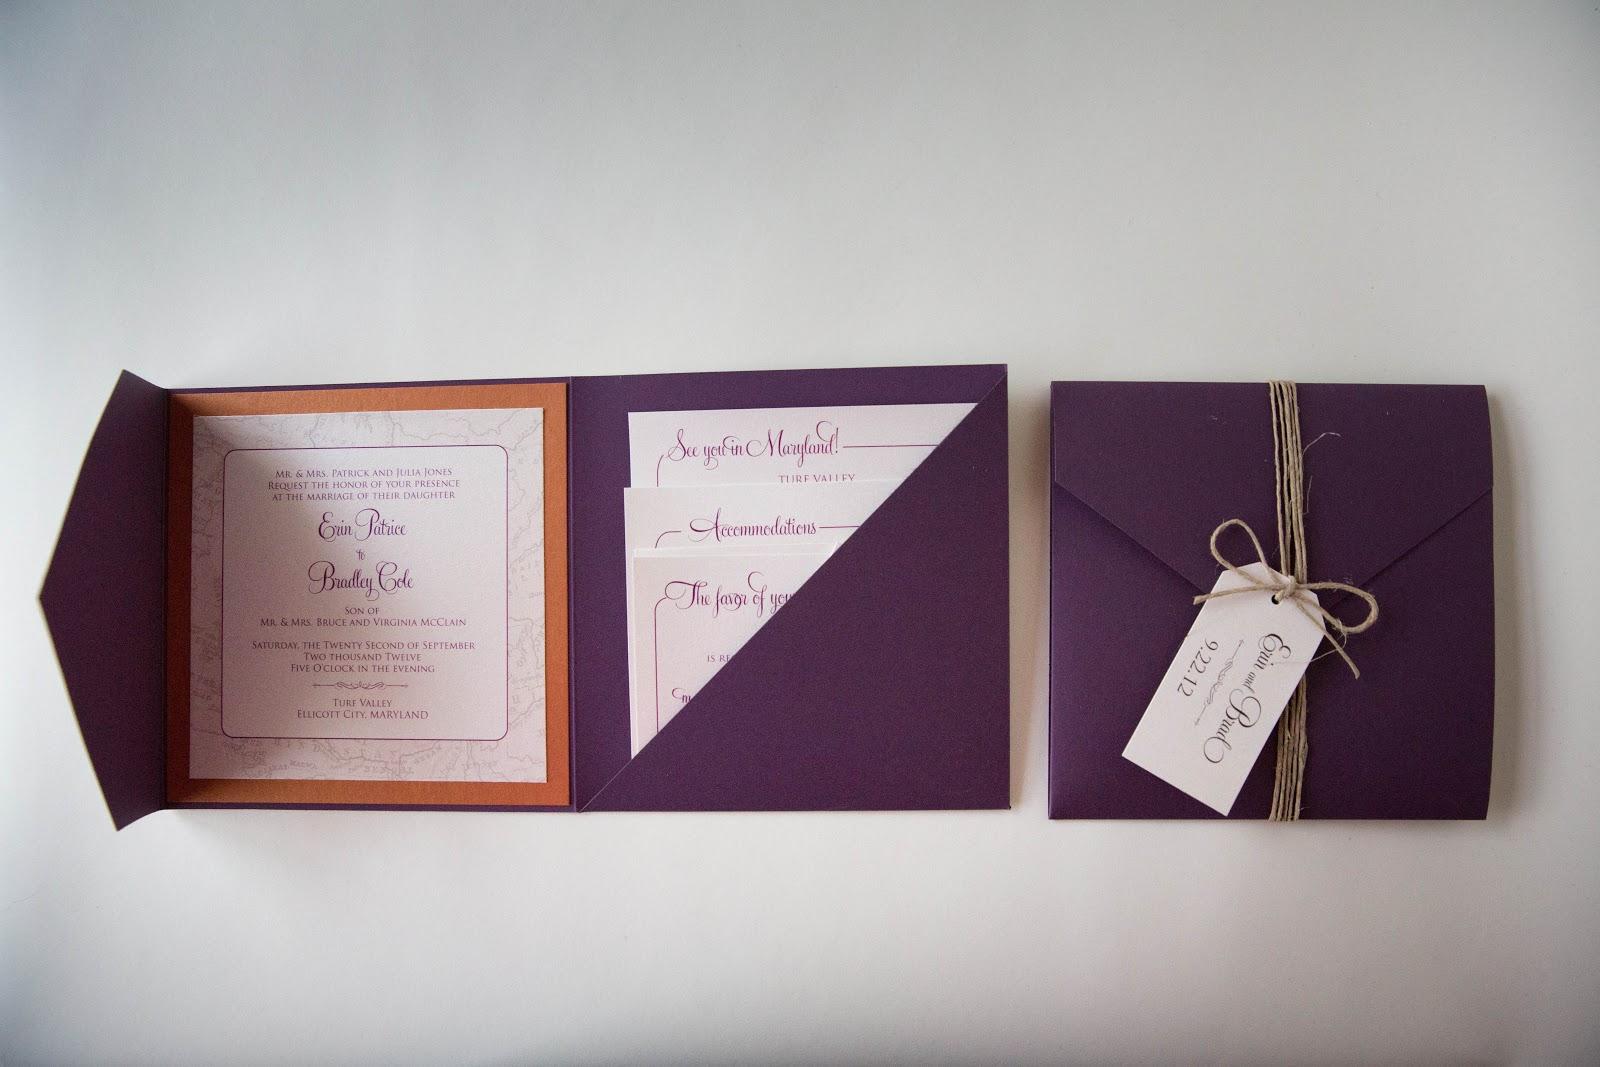 travel themed pocket wedding invitations baltimore wedding invitations baltimore - Travel Themed Wedding Invitations